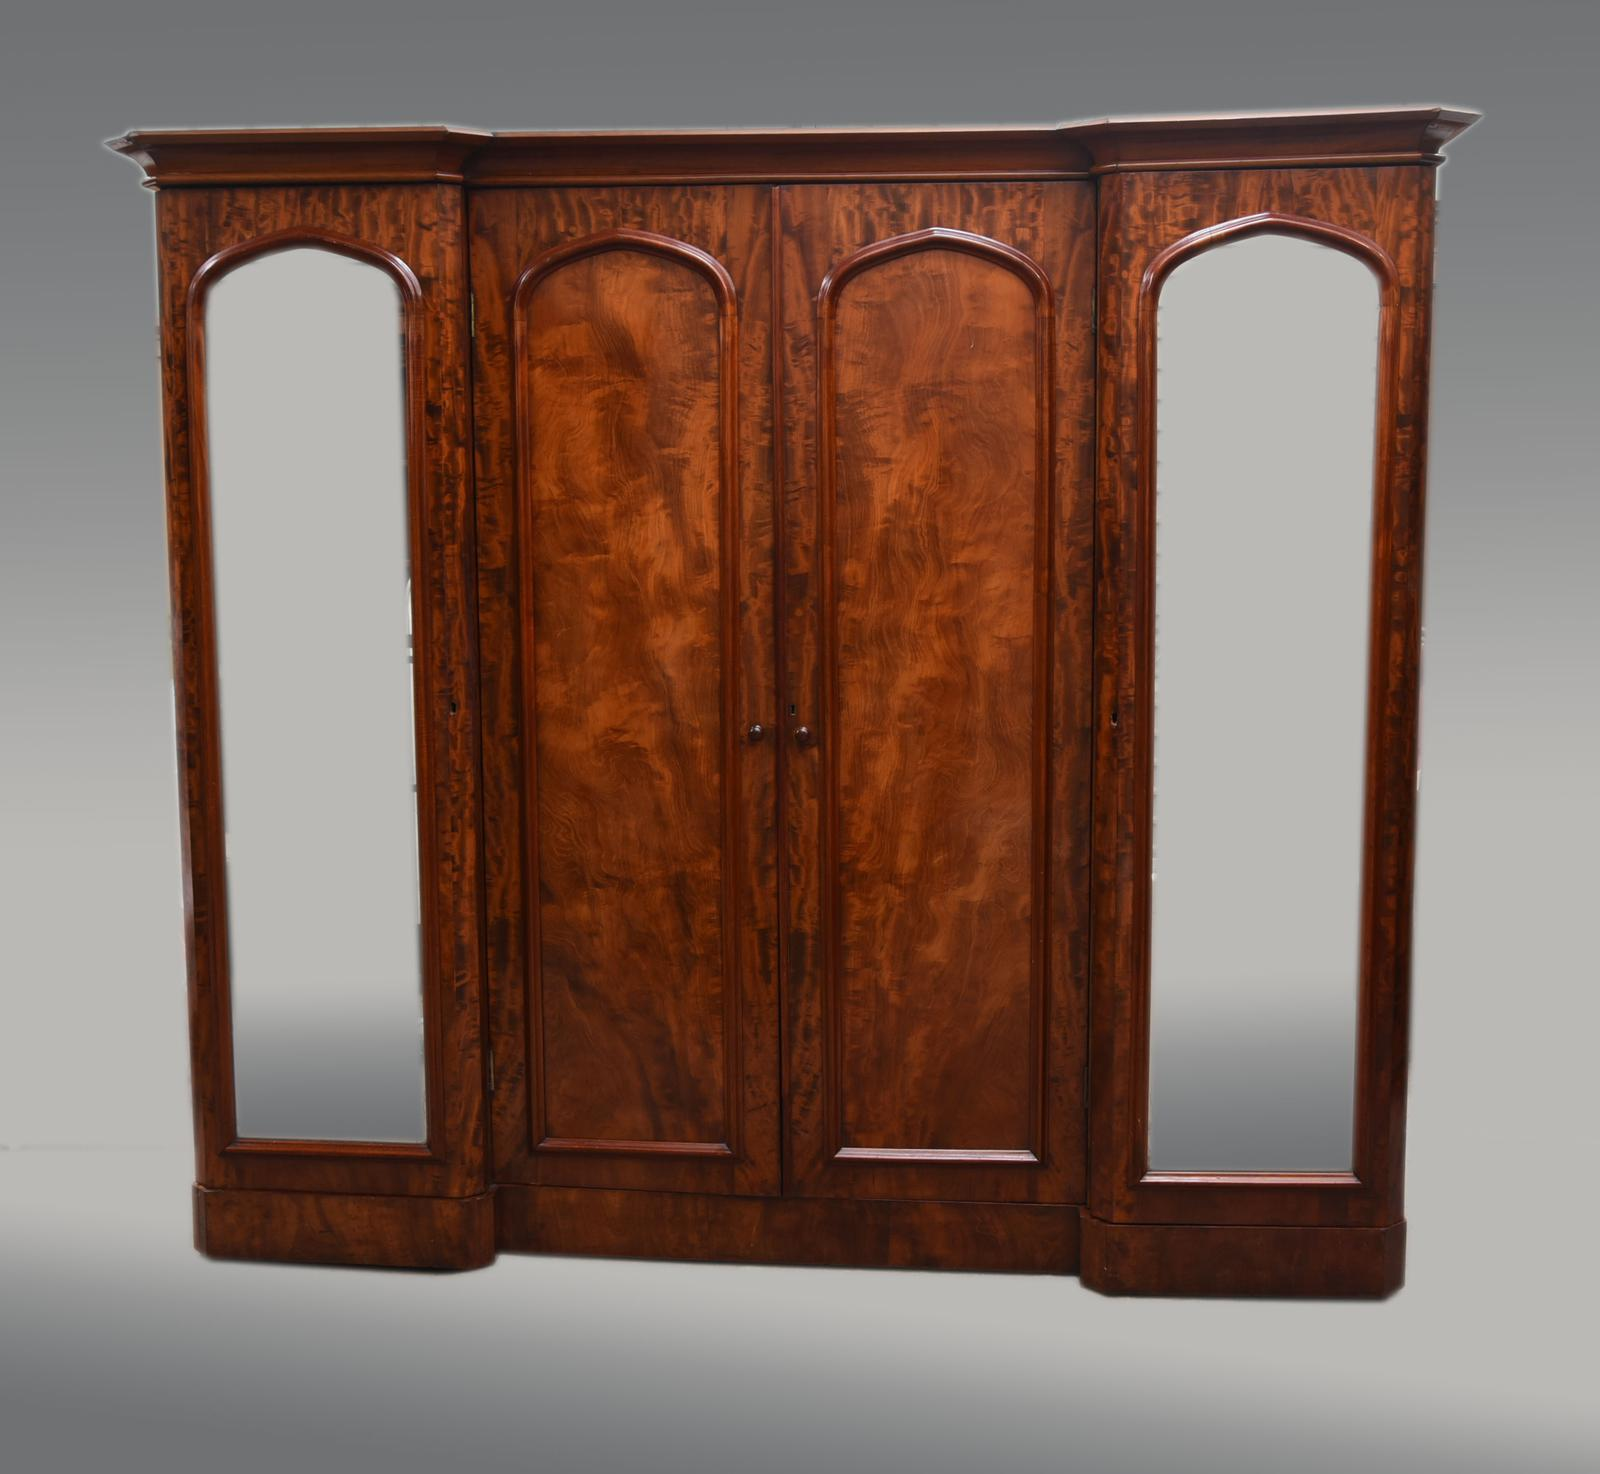 Large Antique Mahogany Four Door Breakfront Compactum Wardrobe (1 of 1)